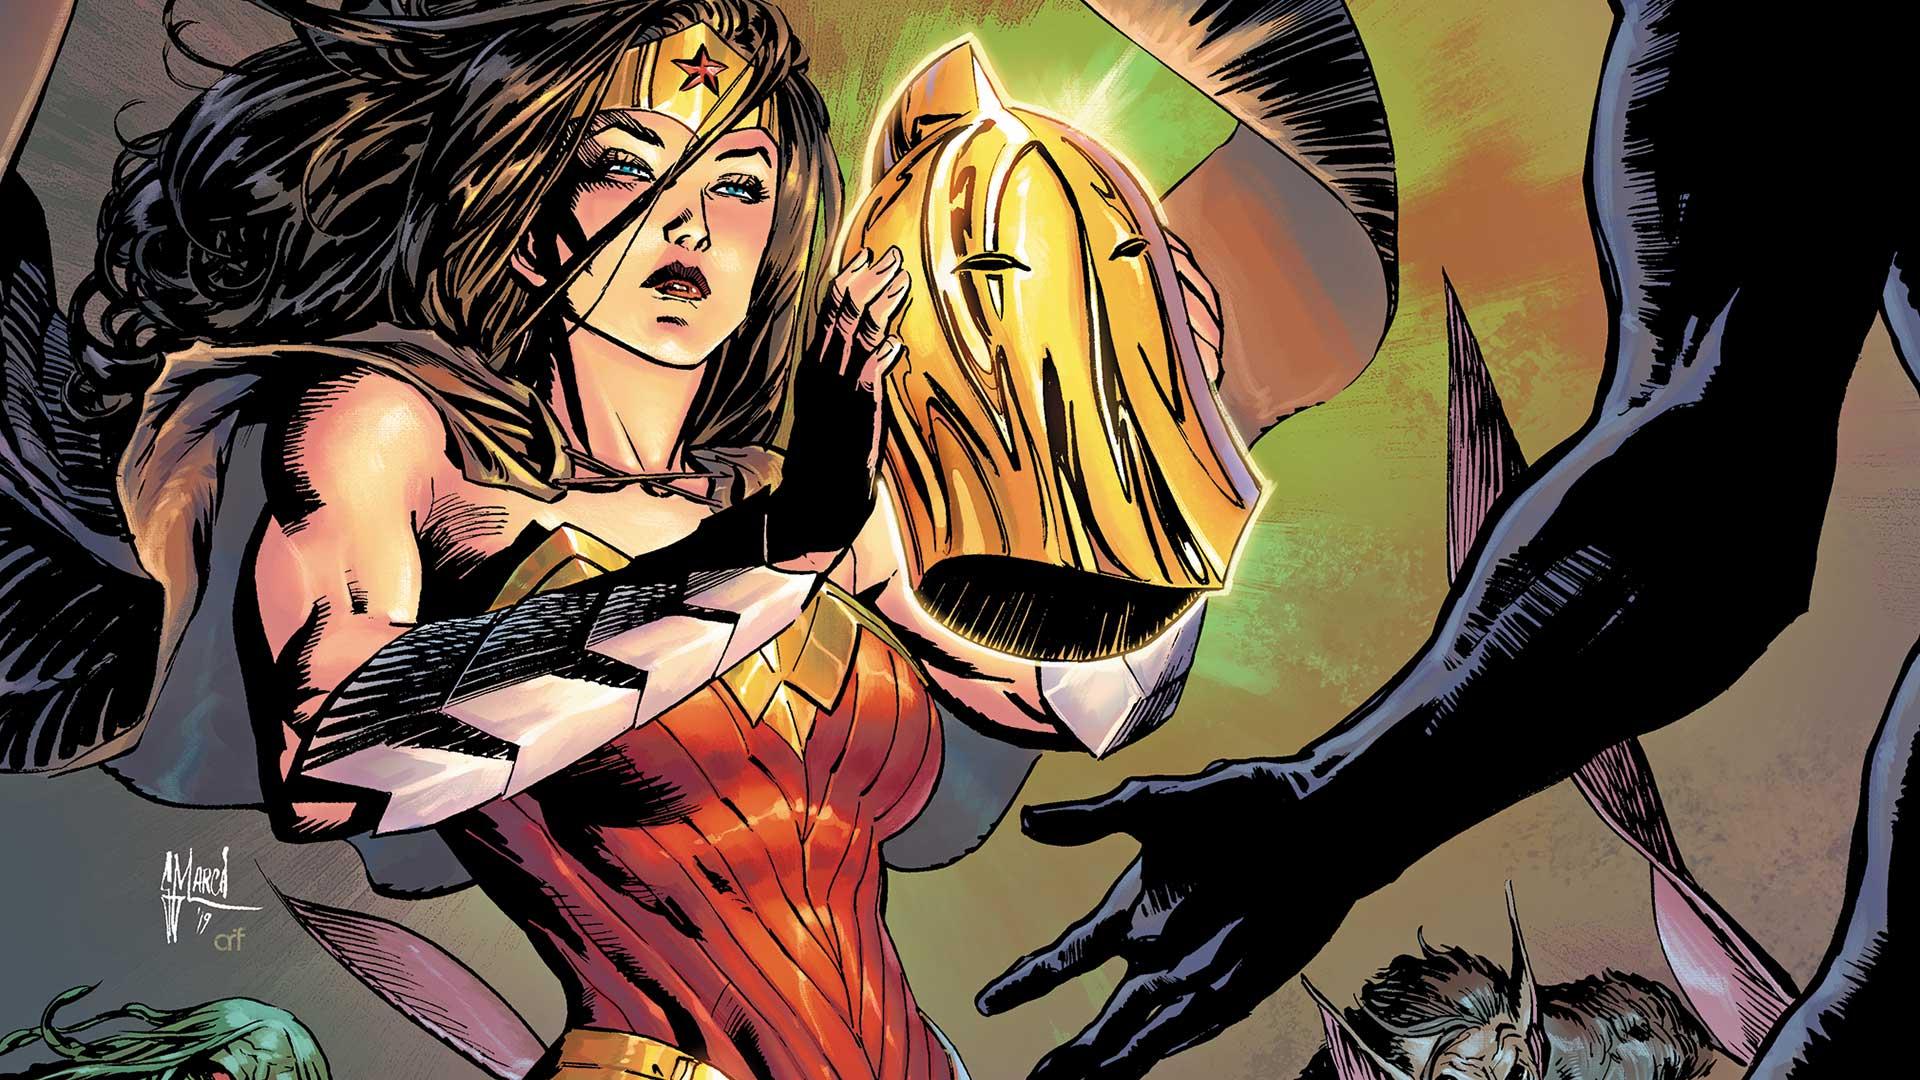 DC Comics JUSTICE LEAGUE DARK #13 first printing